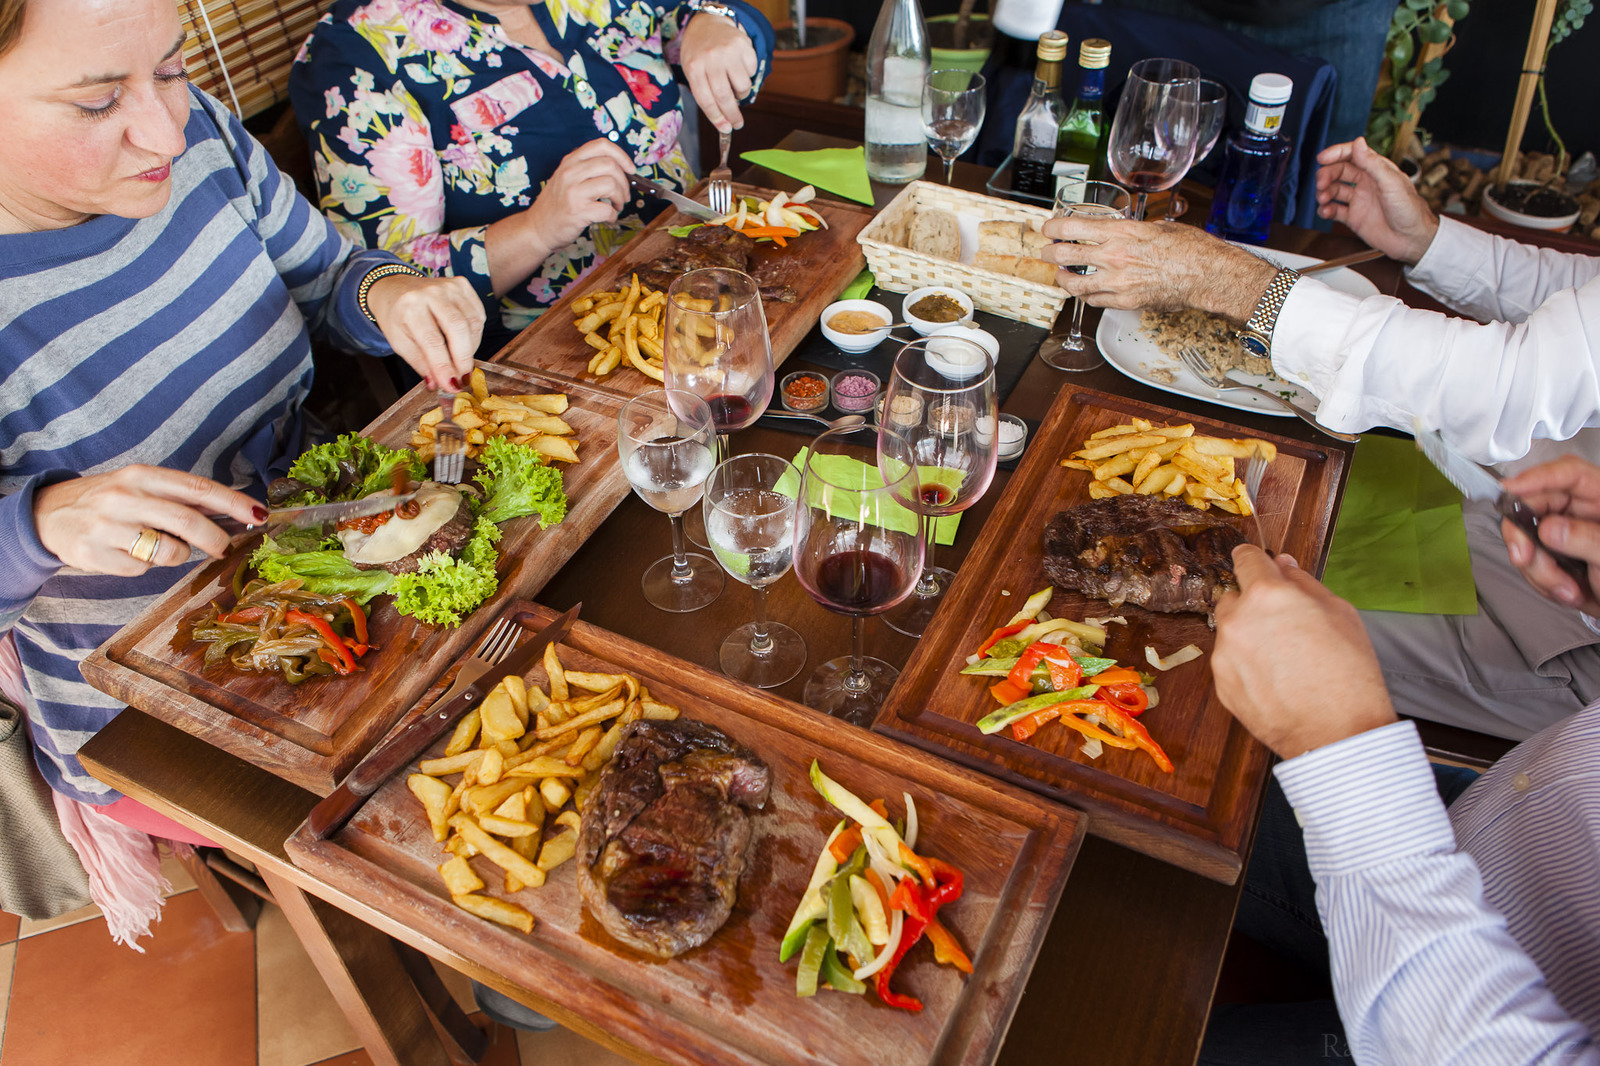 Restaurante La Bohemia de Costa Teguise en Lanzarote, fotografía de Ramón Pérez Niz